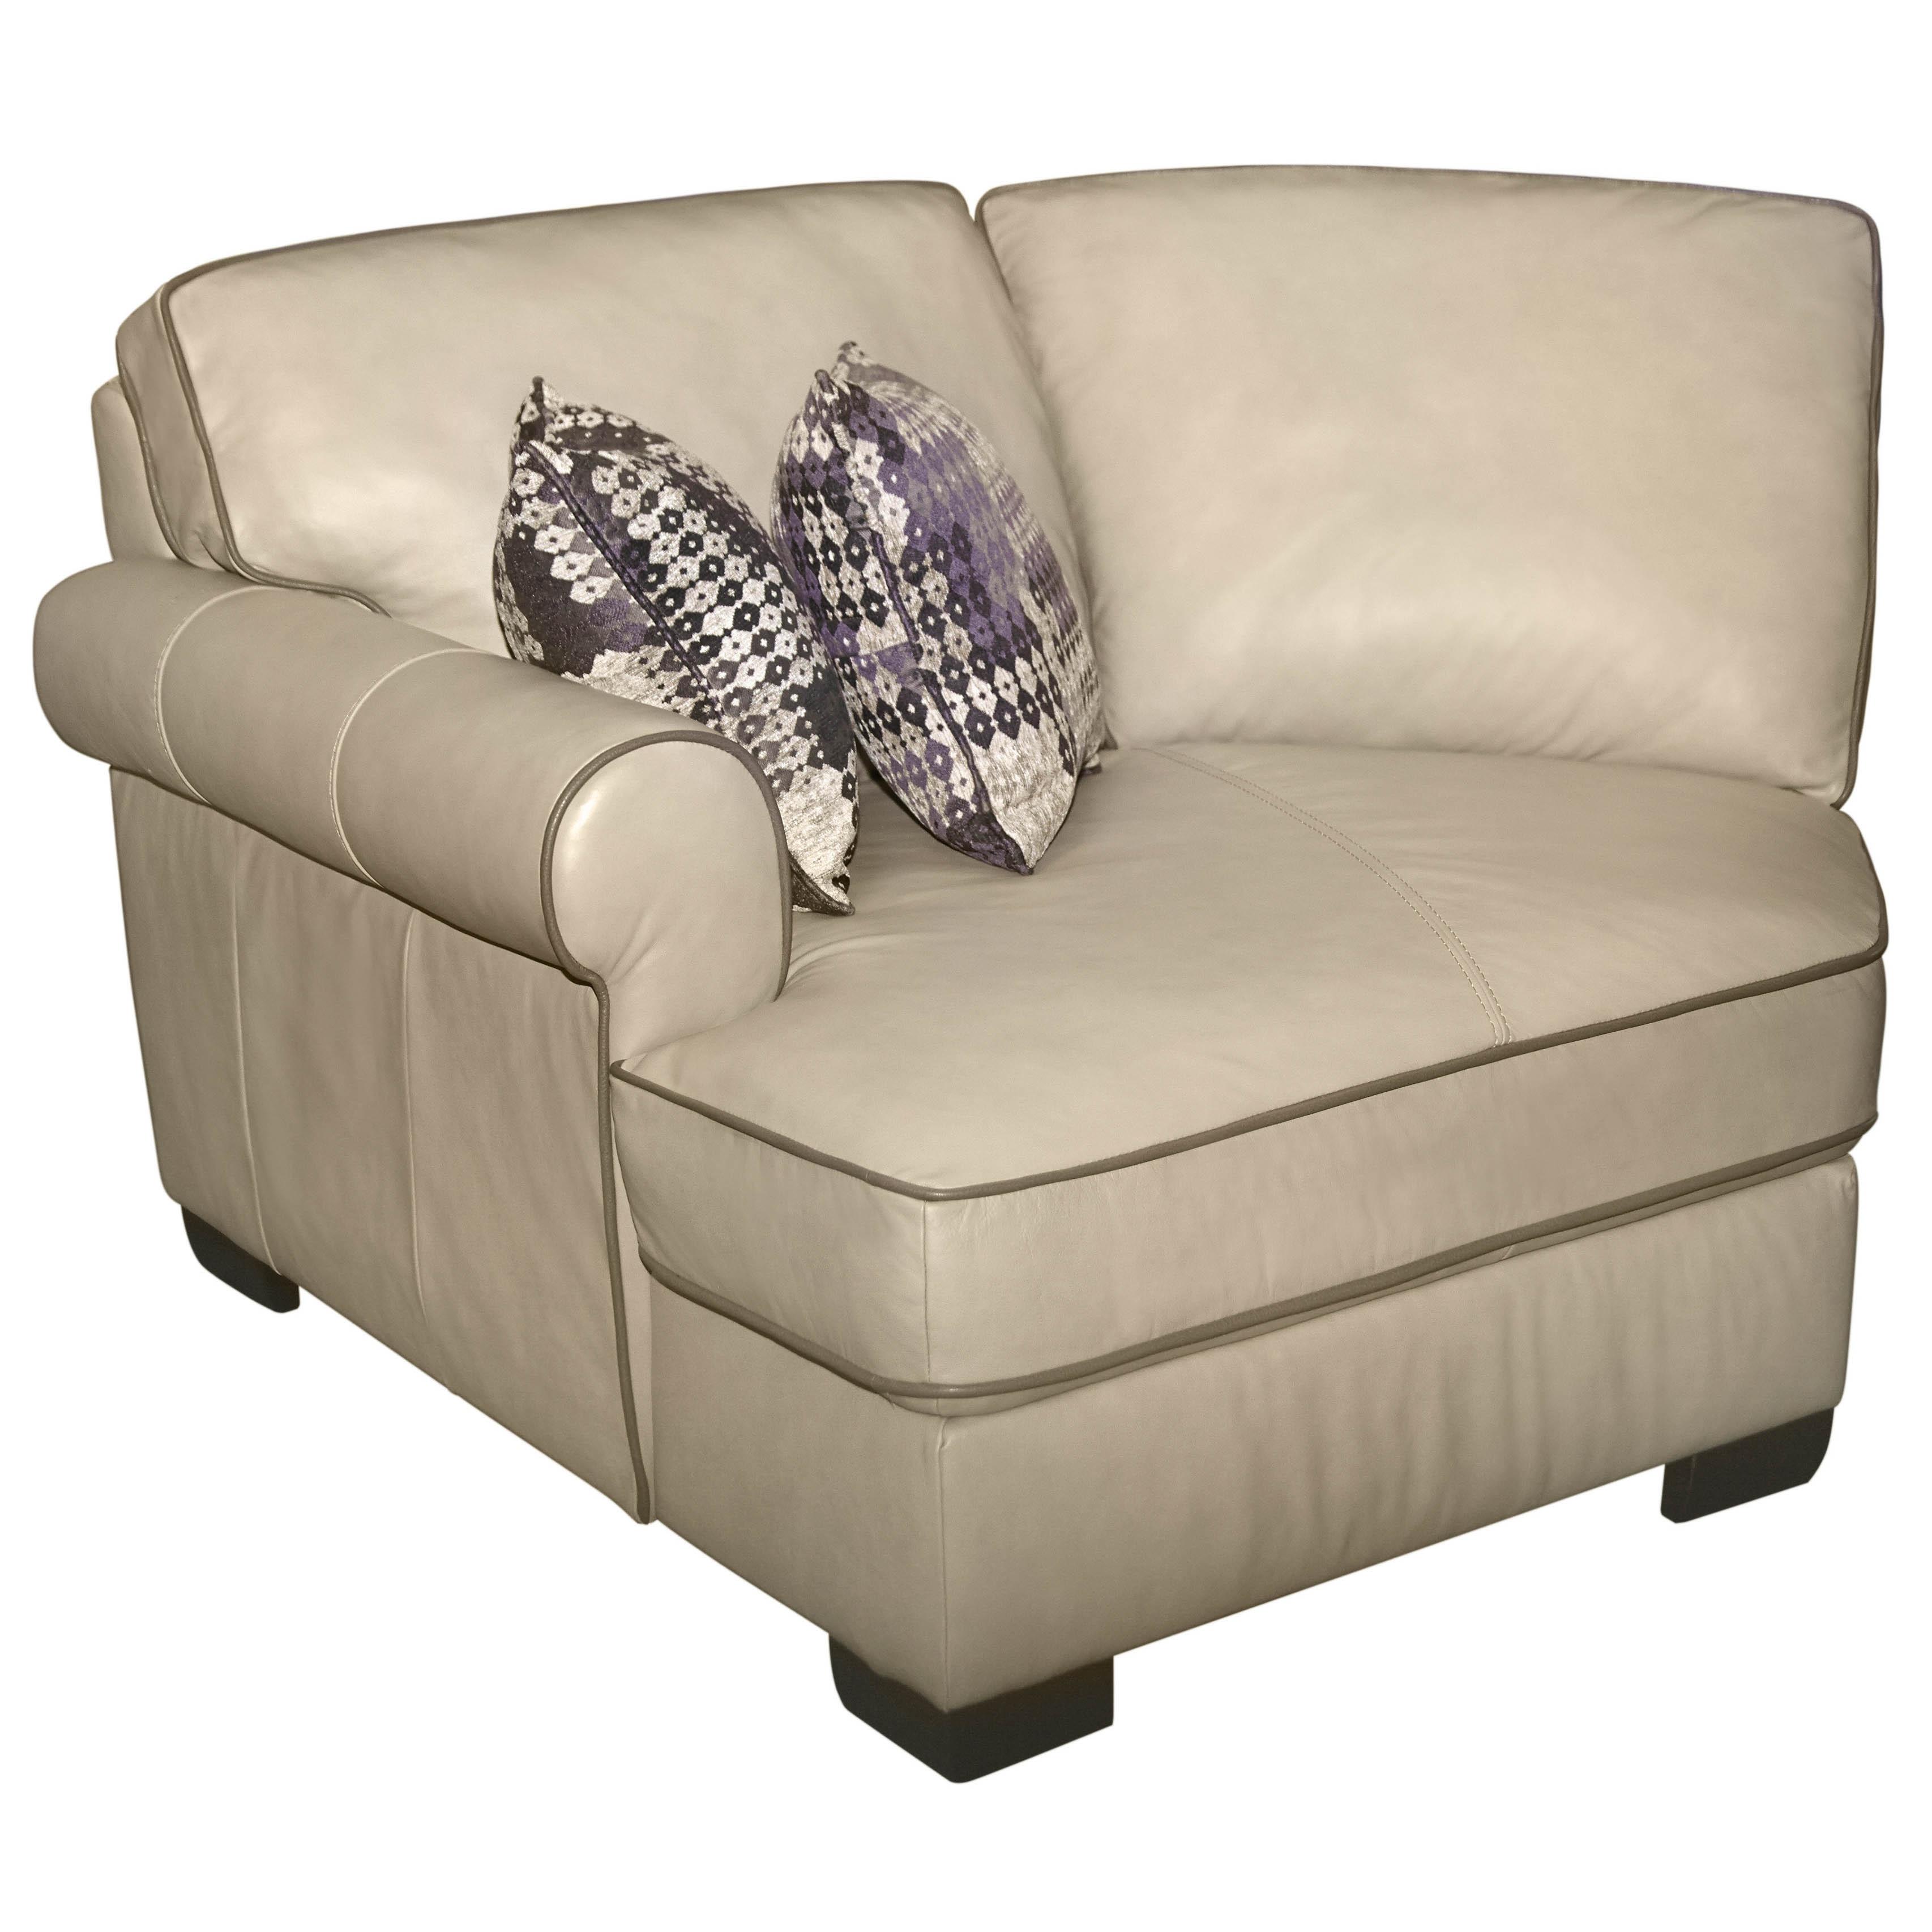 Amazing Art Van Coco 3 Piece Sectional Beatyapartments Chair Design Images Beatyapartmentscom